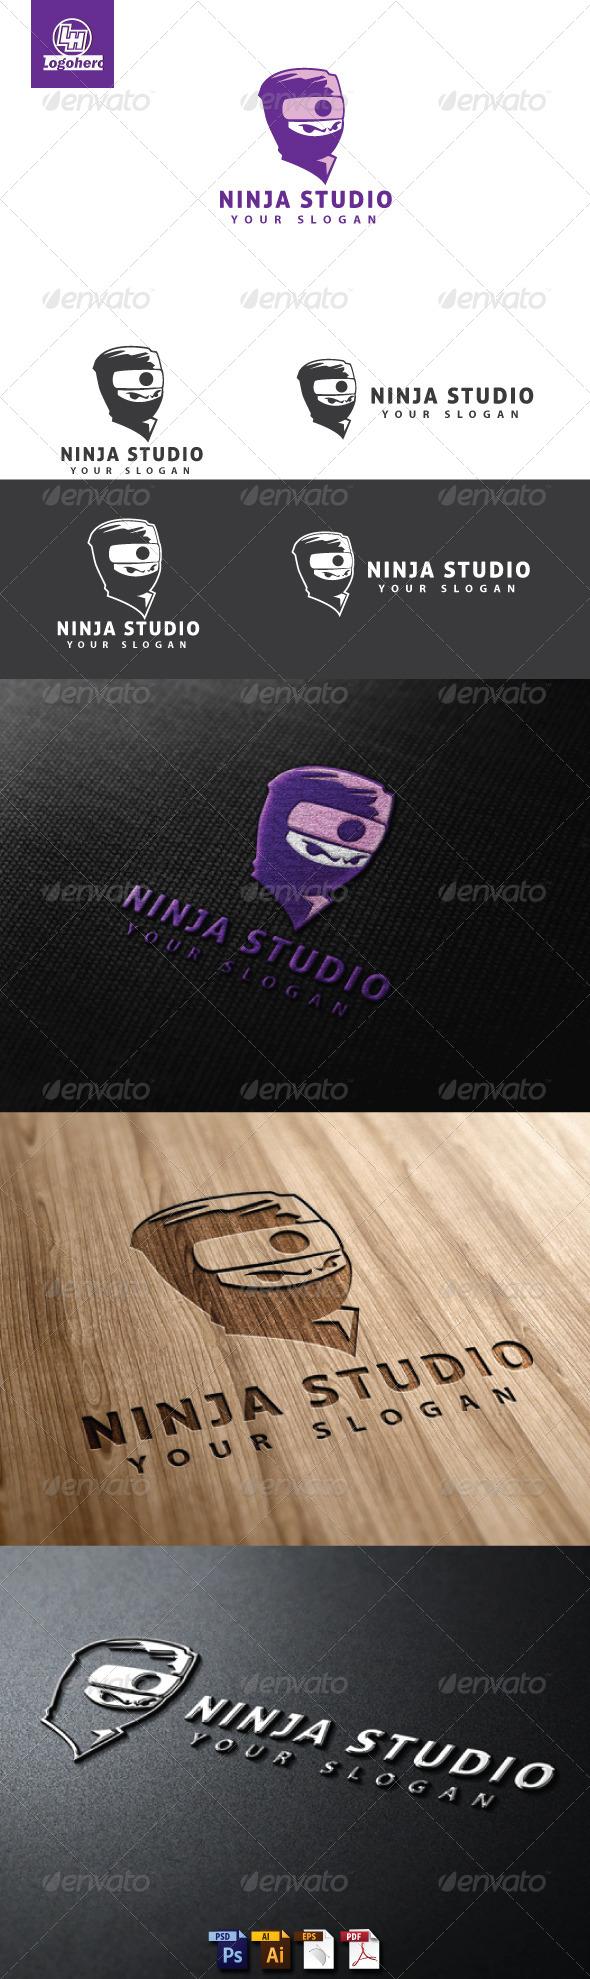 Ninja Studio Logo Template